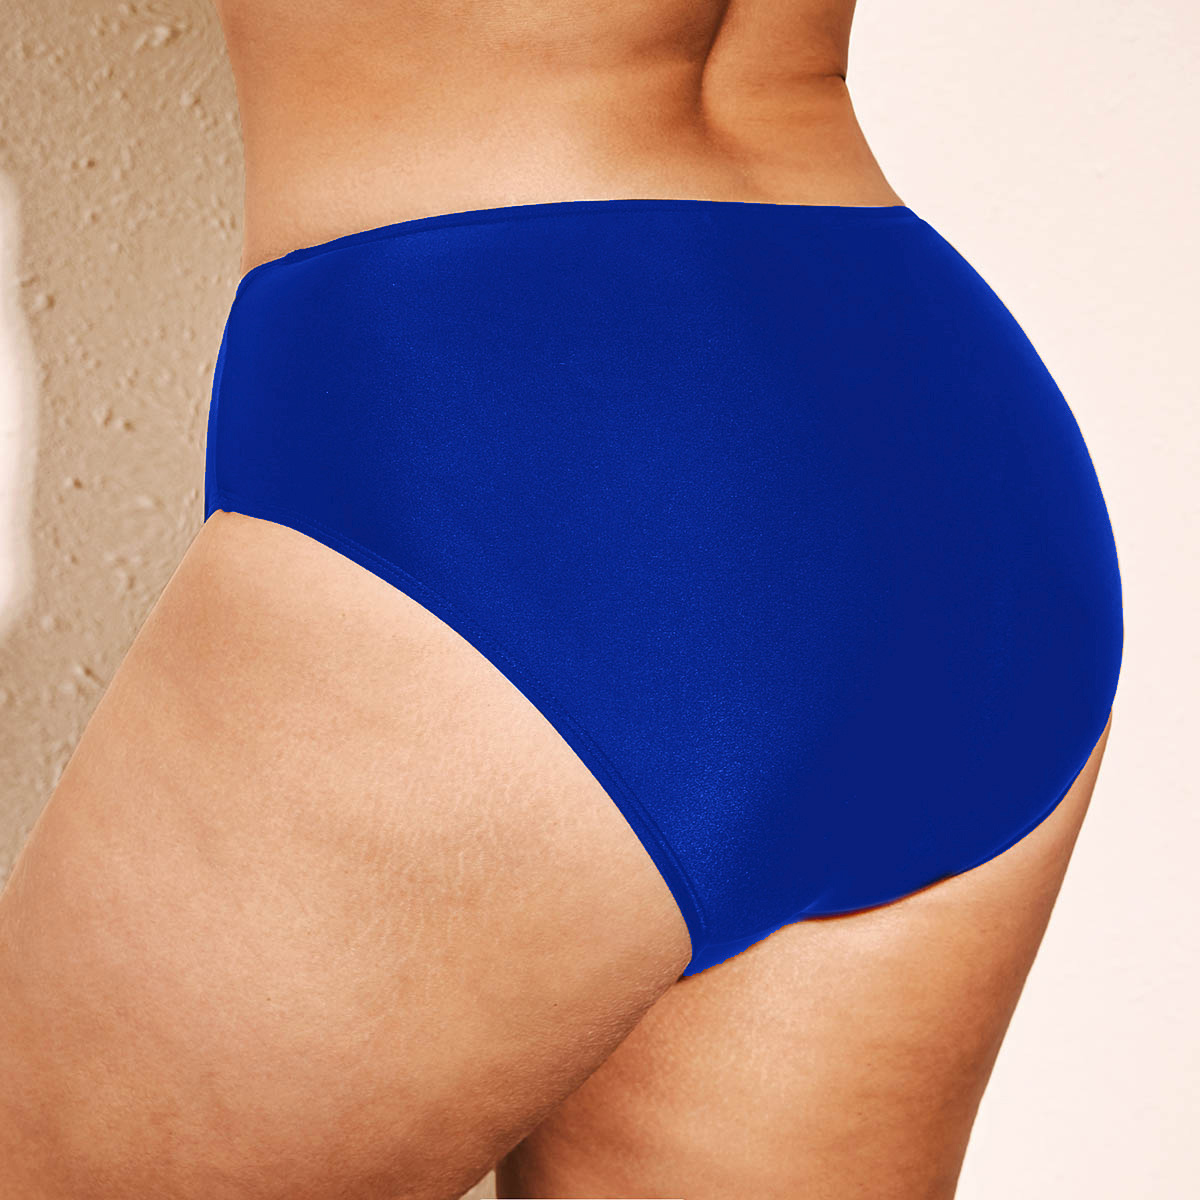 Blue Plus Size Low Waist Swimwear Panty